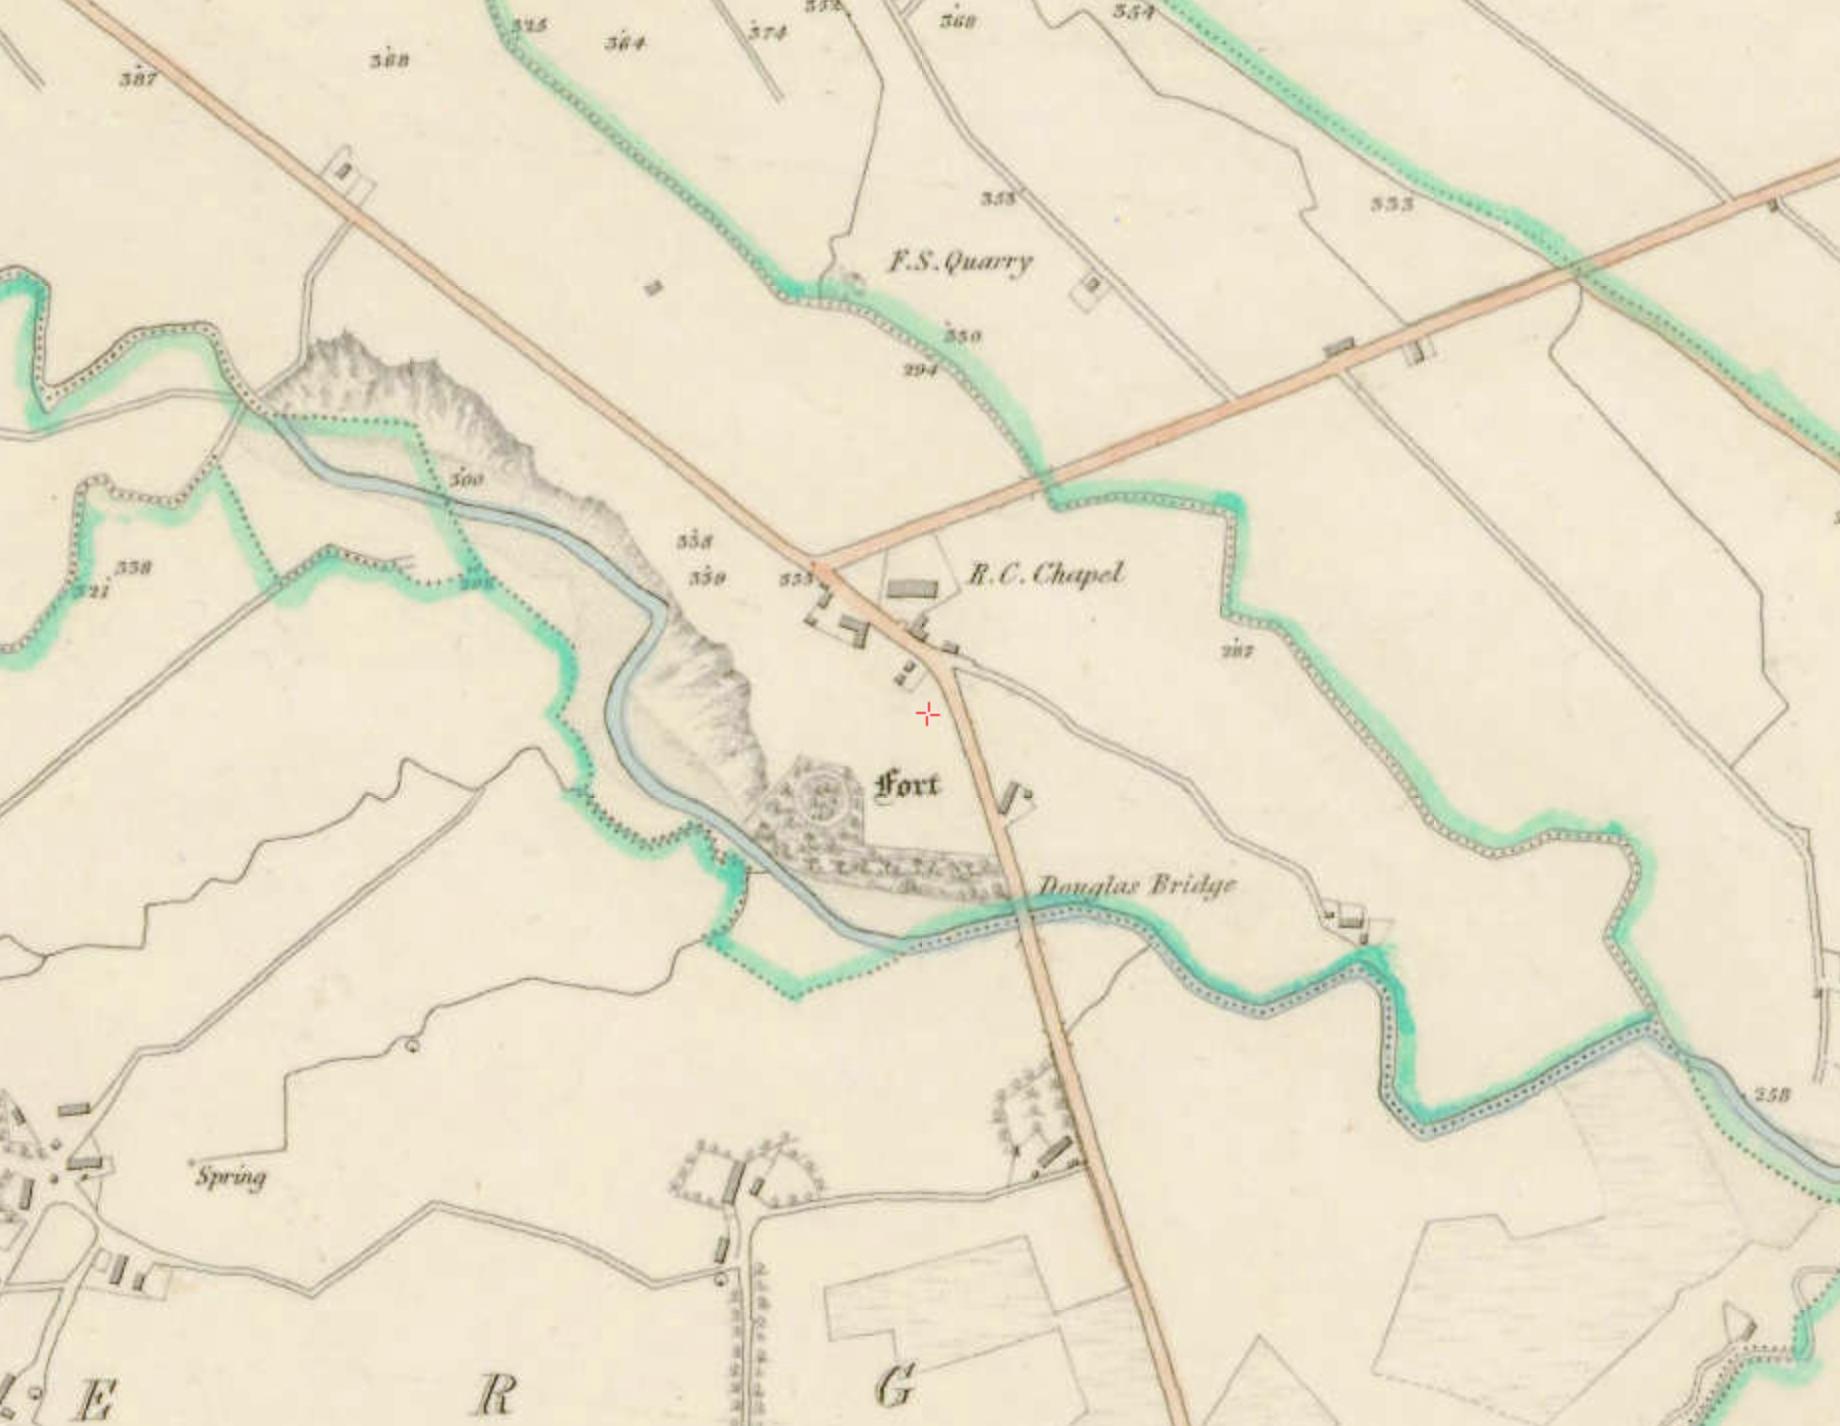 "Moneyneena 1:5000, Historic 6"" Map 1842 . ©Ordnance Survey Ireland, 2017"